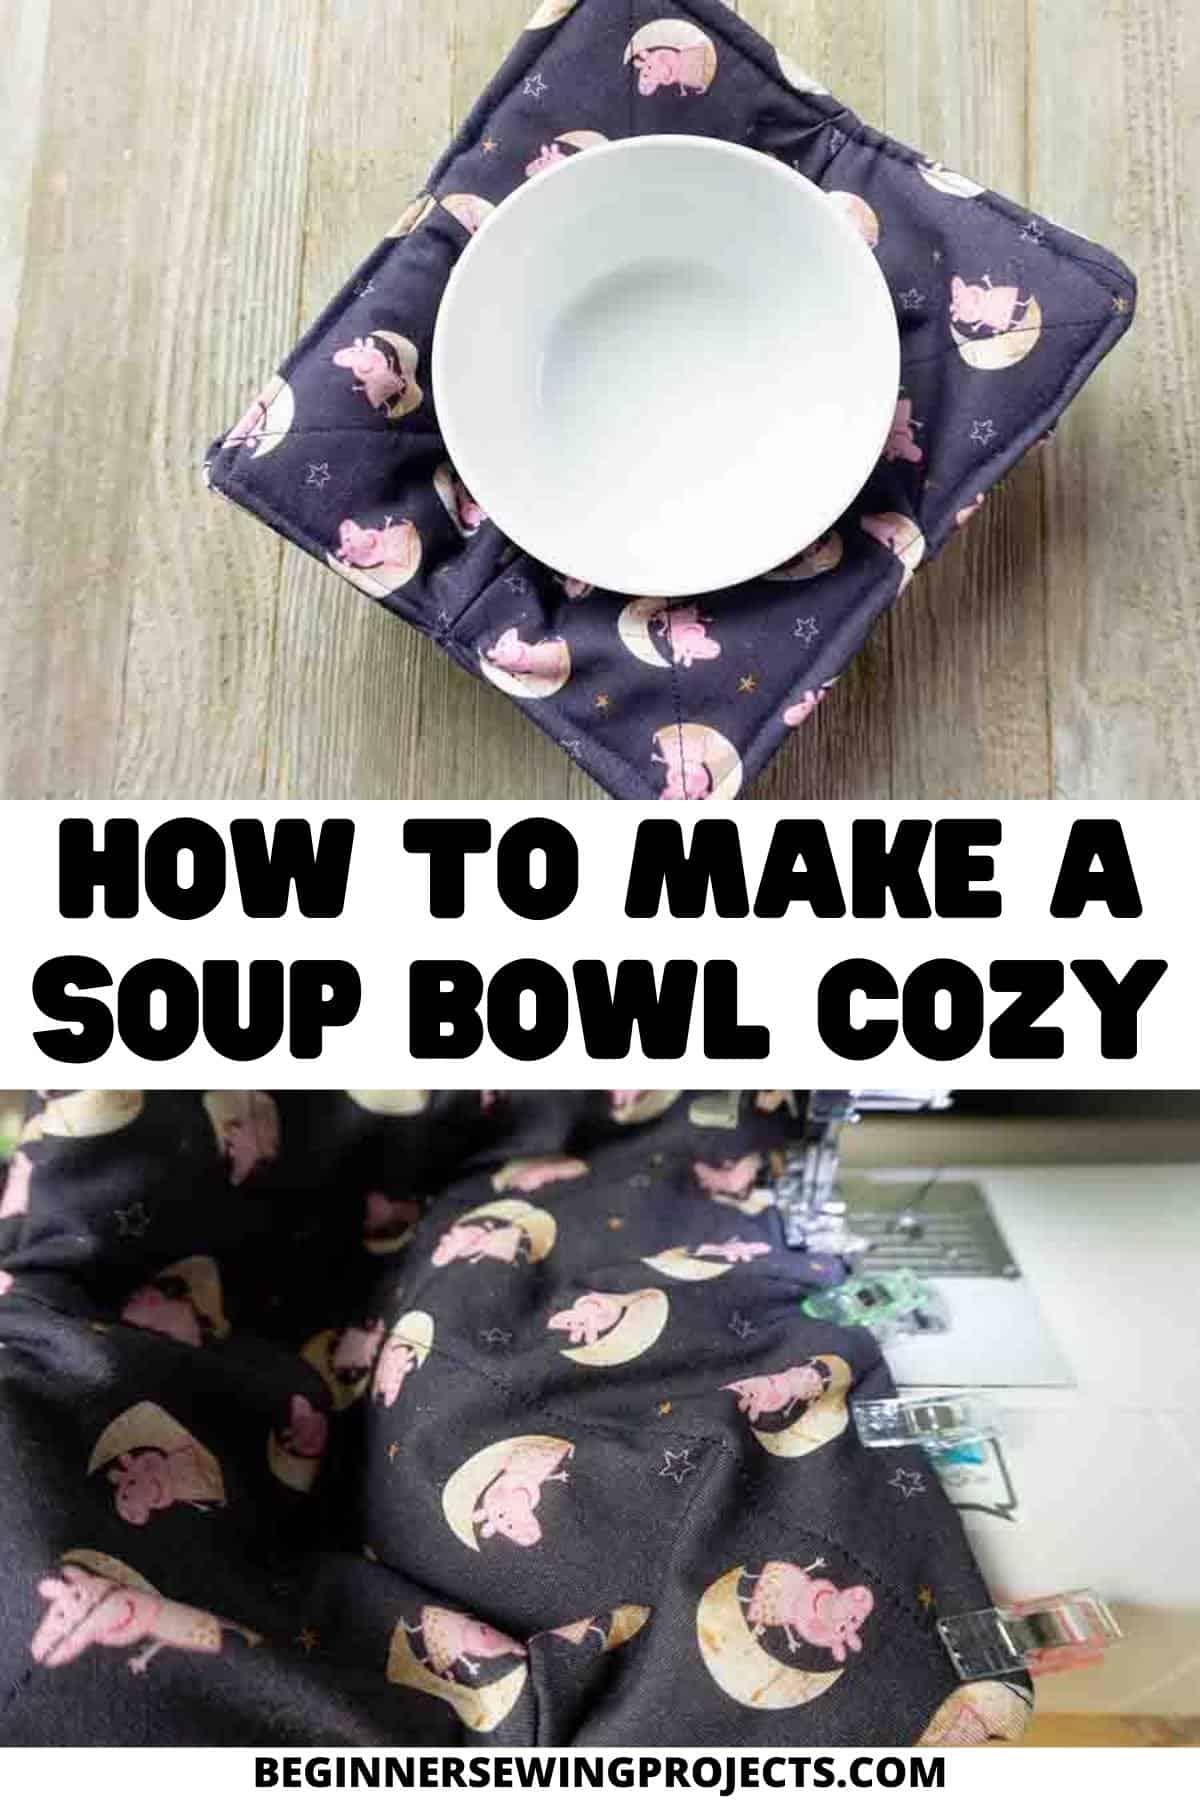 How To Make A Soup Bowl Cozy